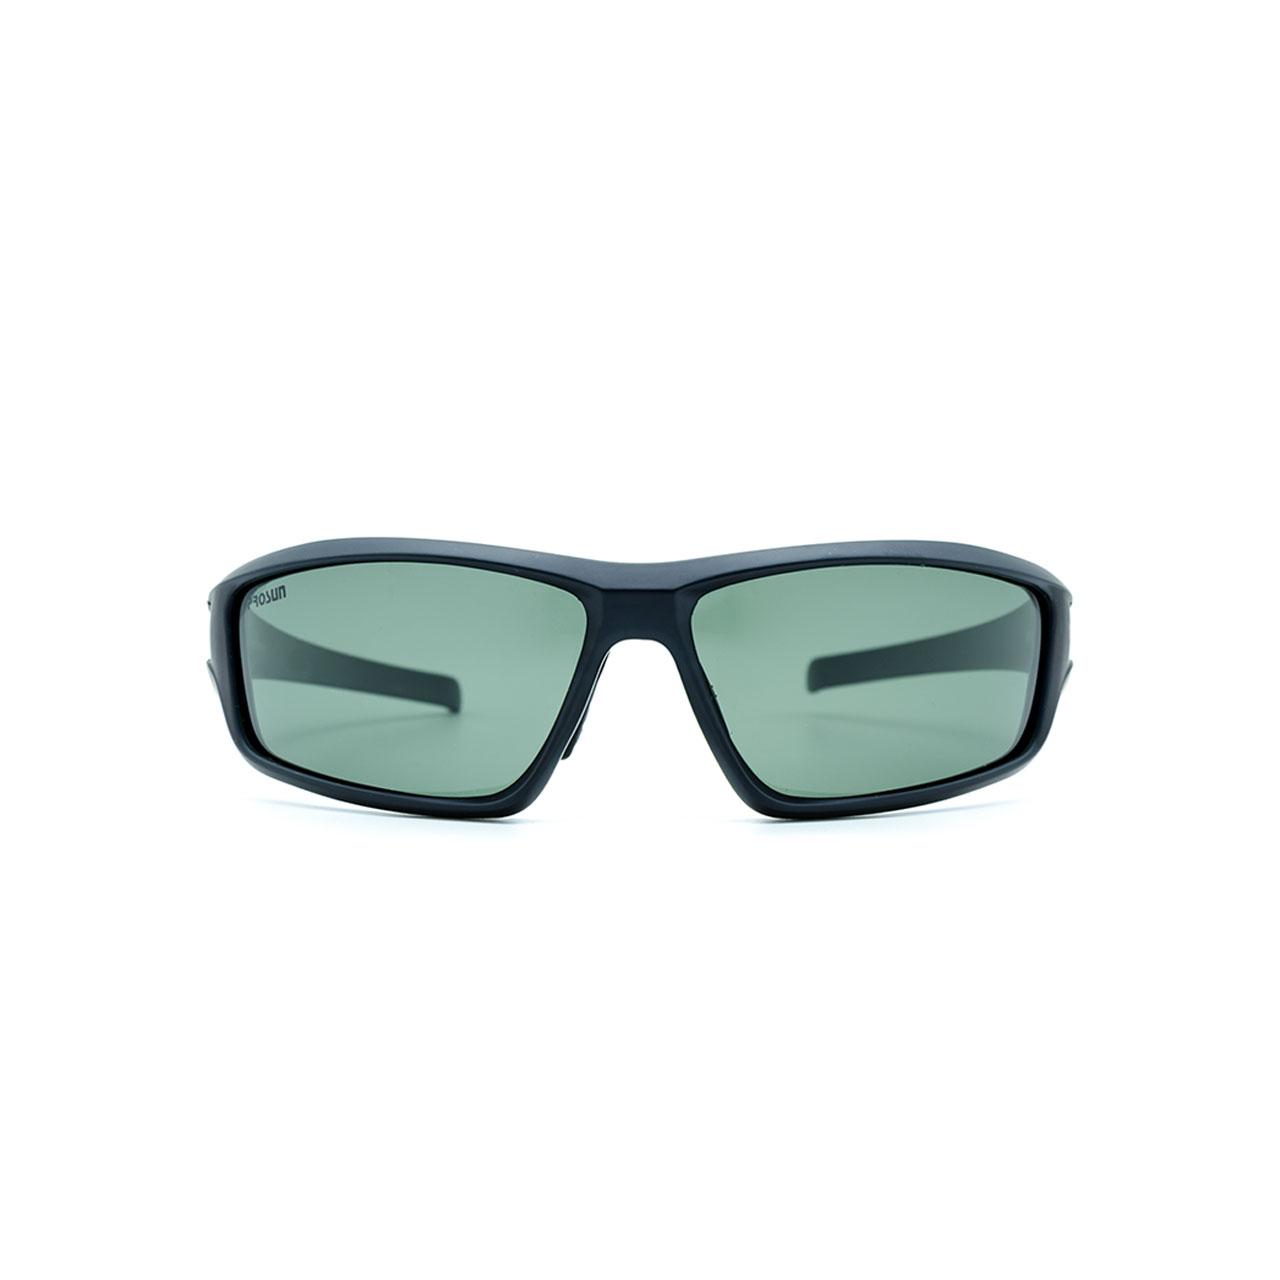 عینک آفتابی پروسان مدل Aaron_c1